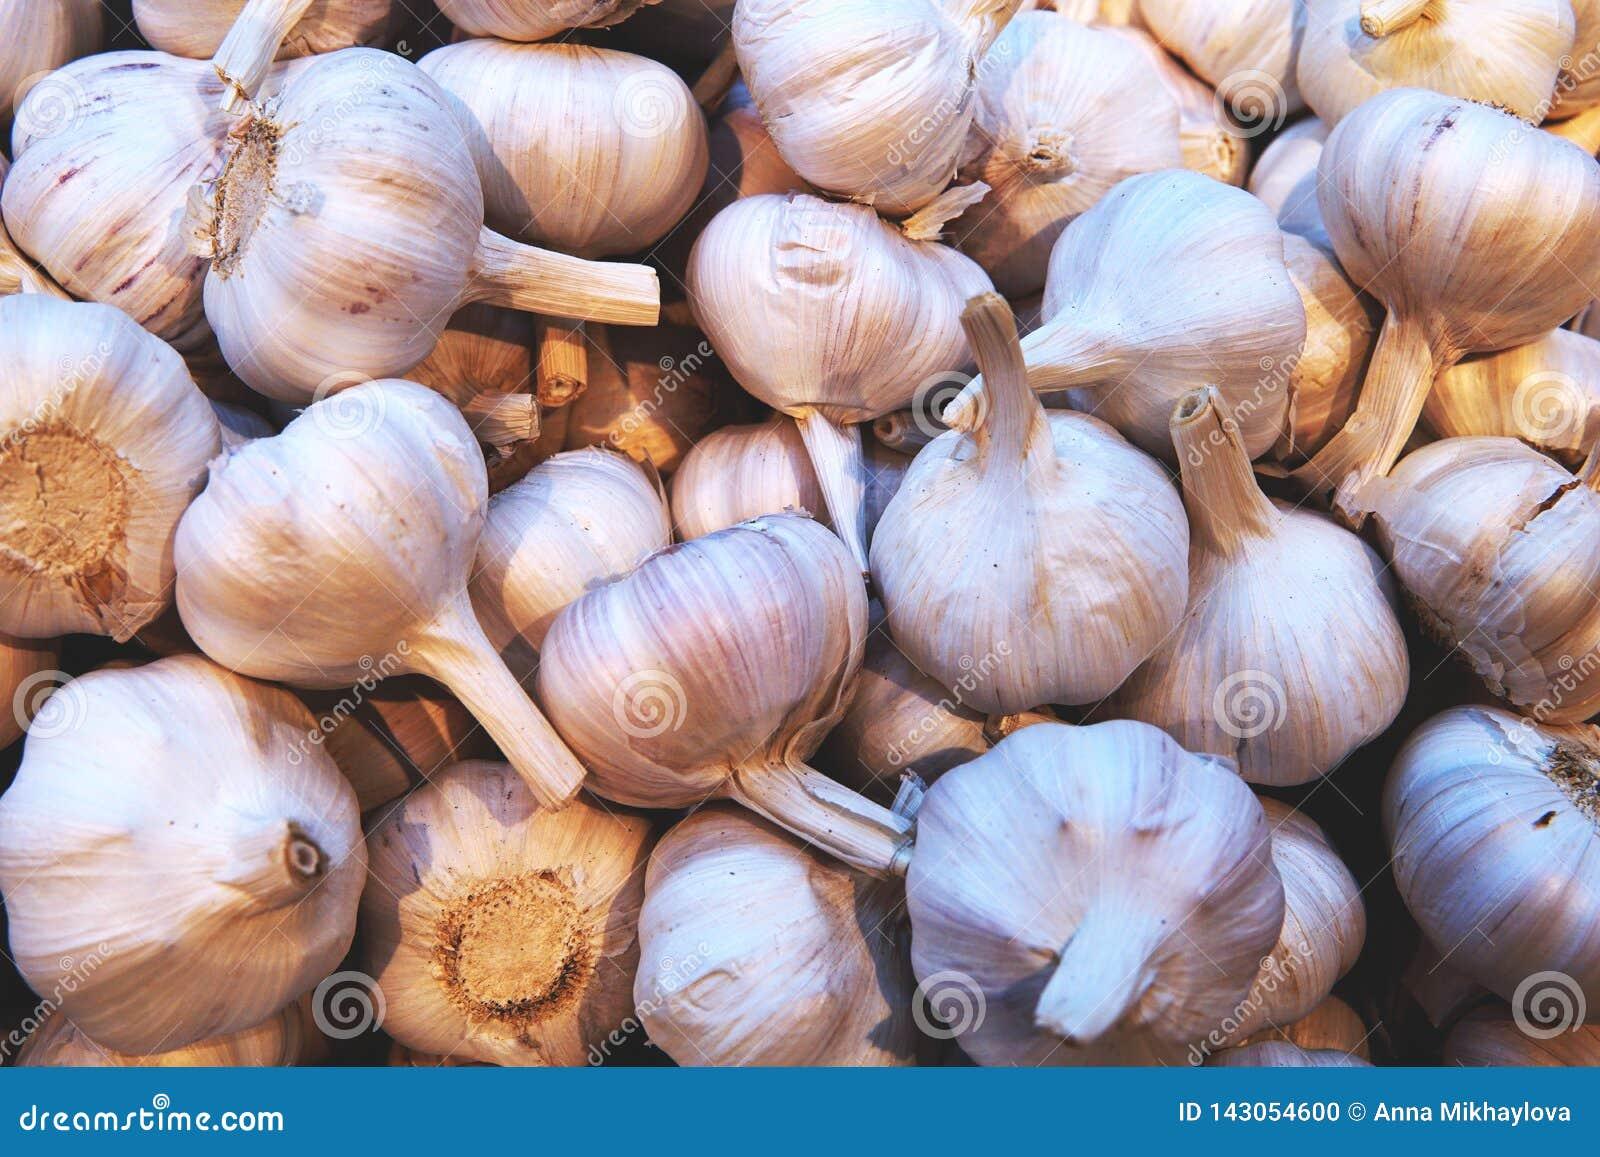 Garlic pile texture.